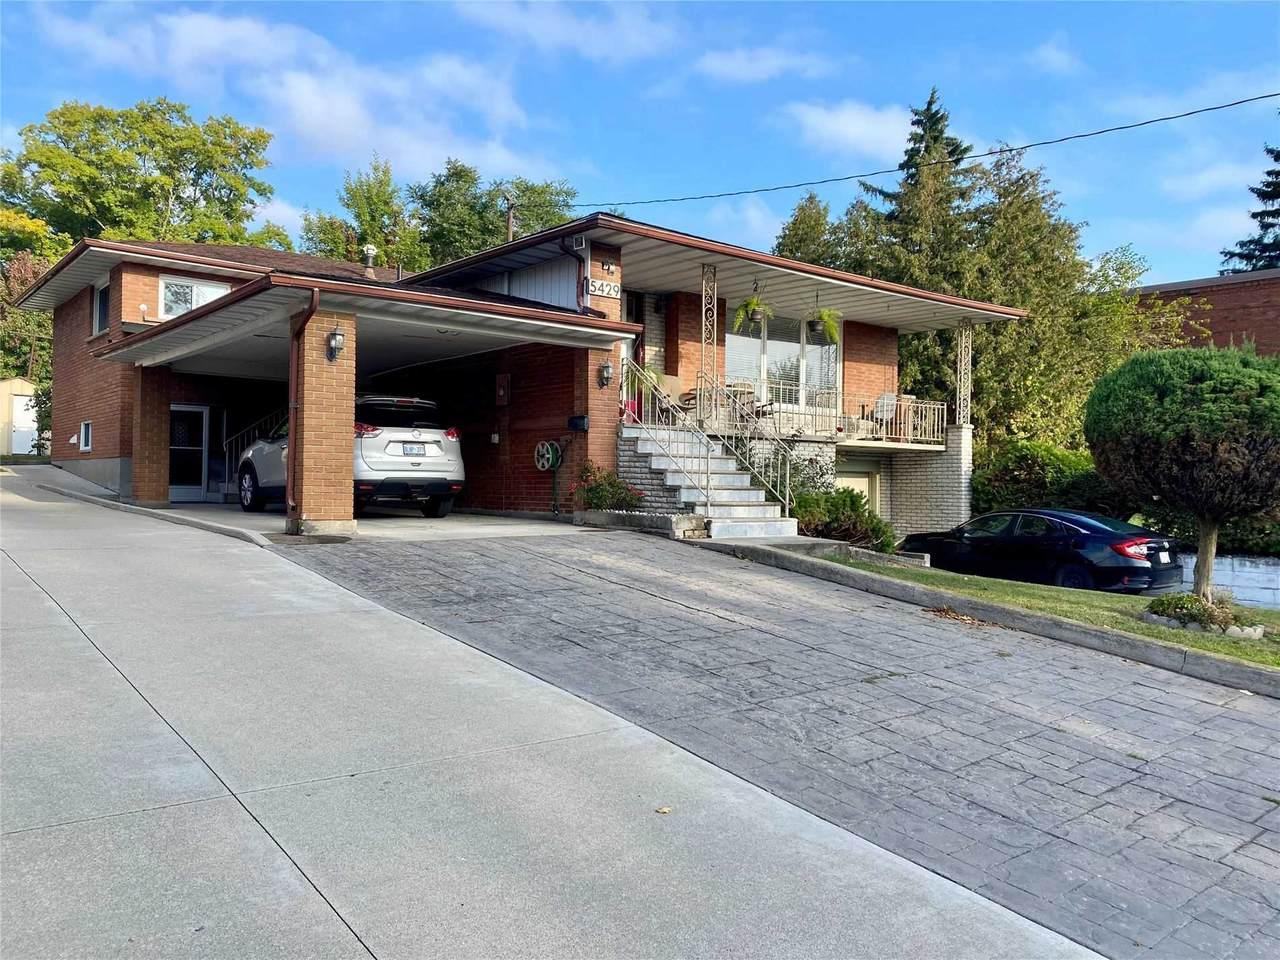 5429 Ontario Ave - Photo 1